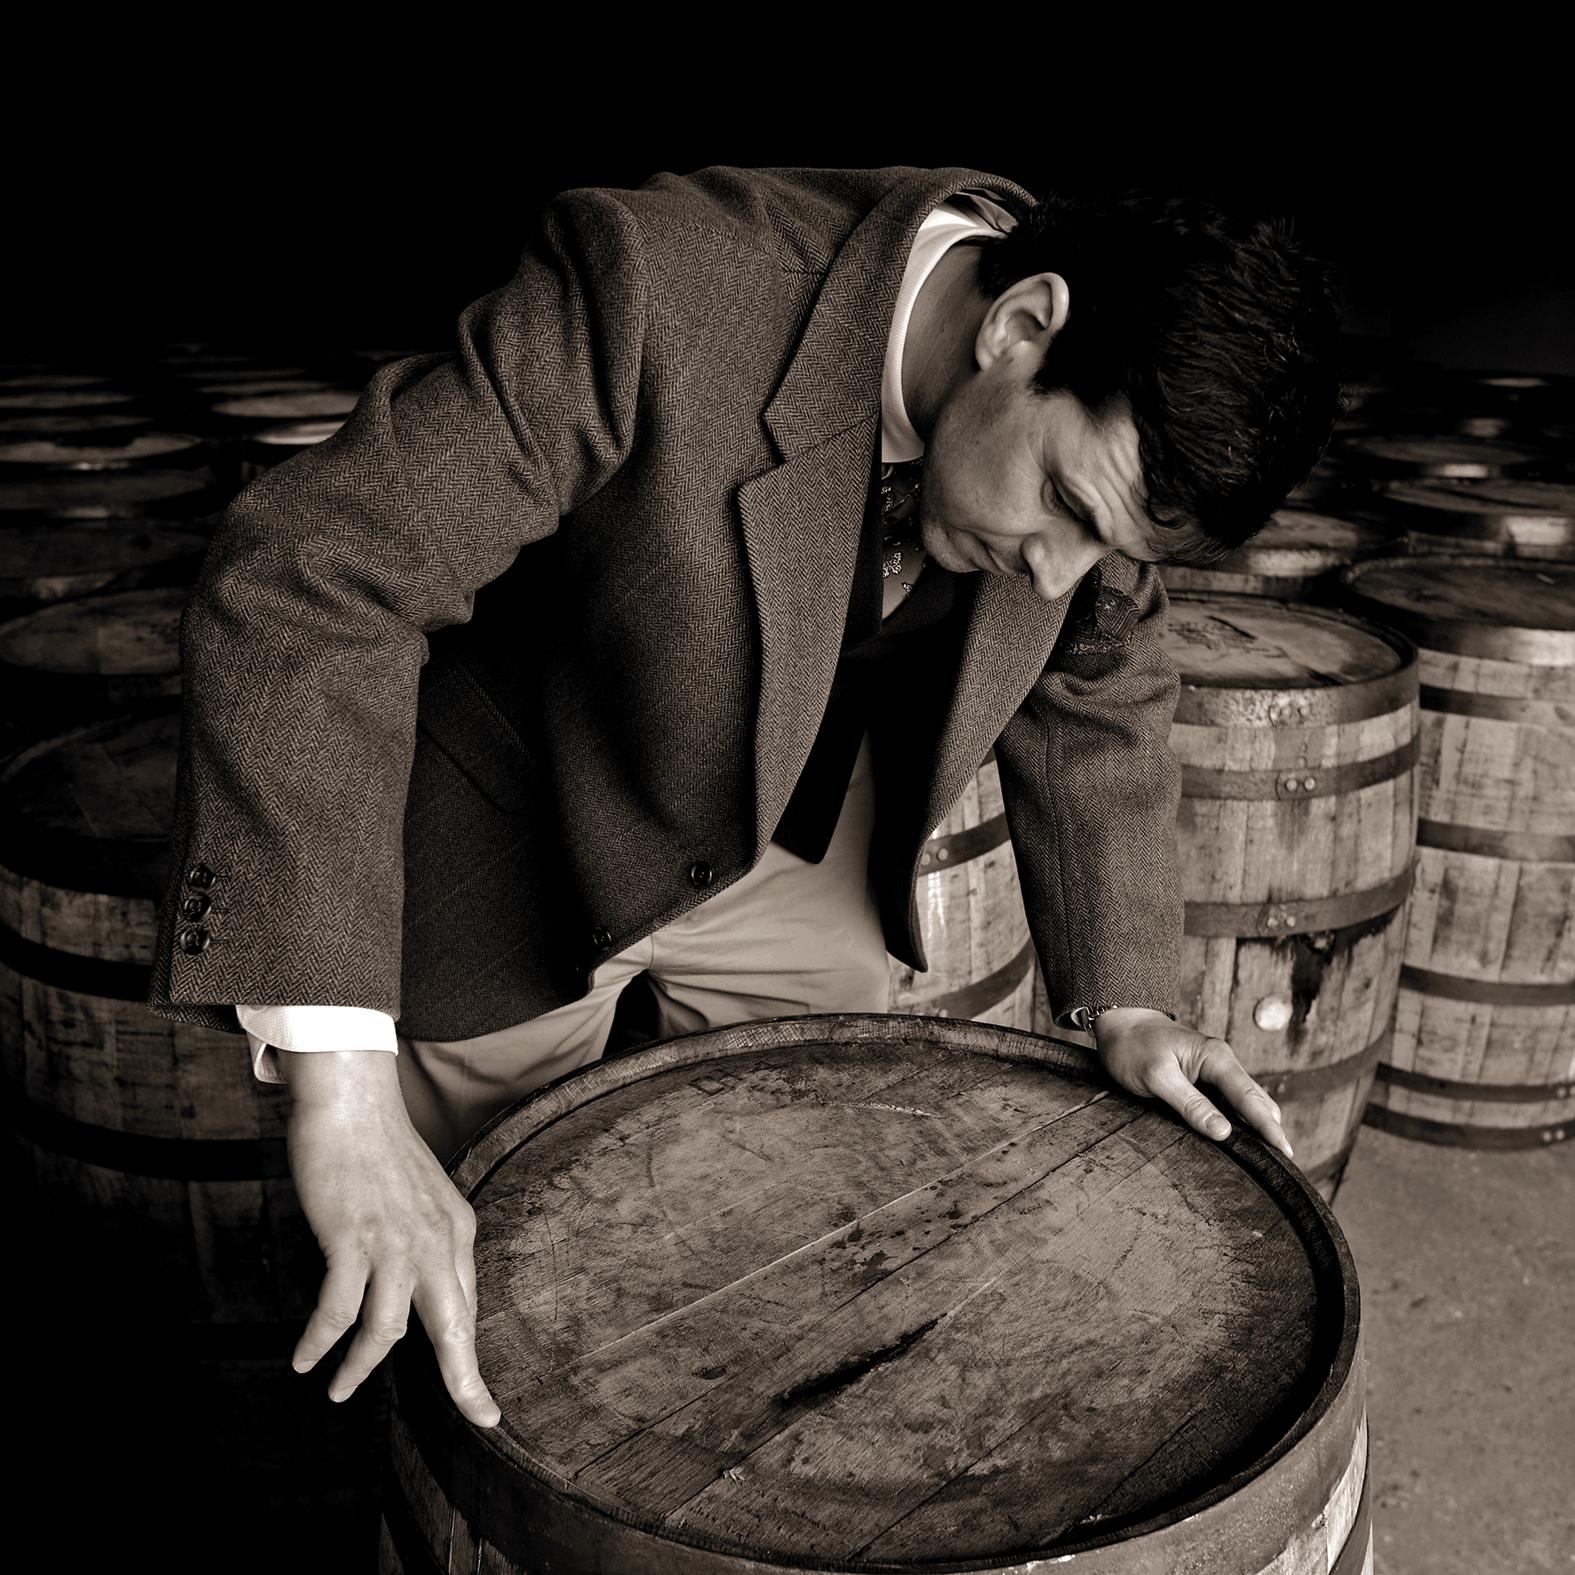 Glenmorangie Dr Bill Lumsden Head of Distilling & Whisky Creation